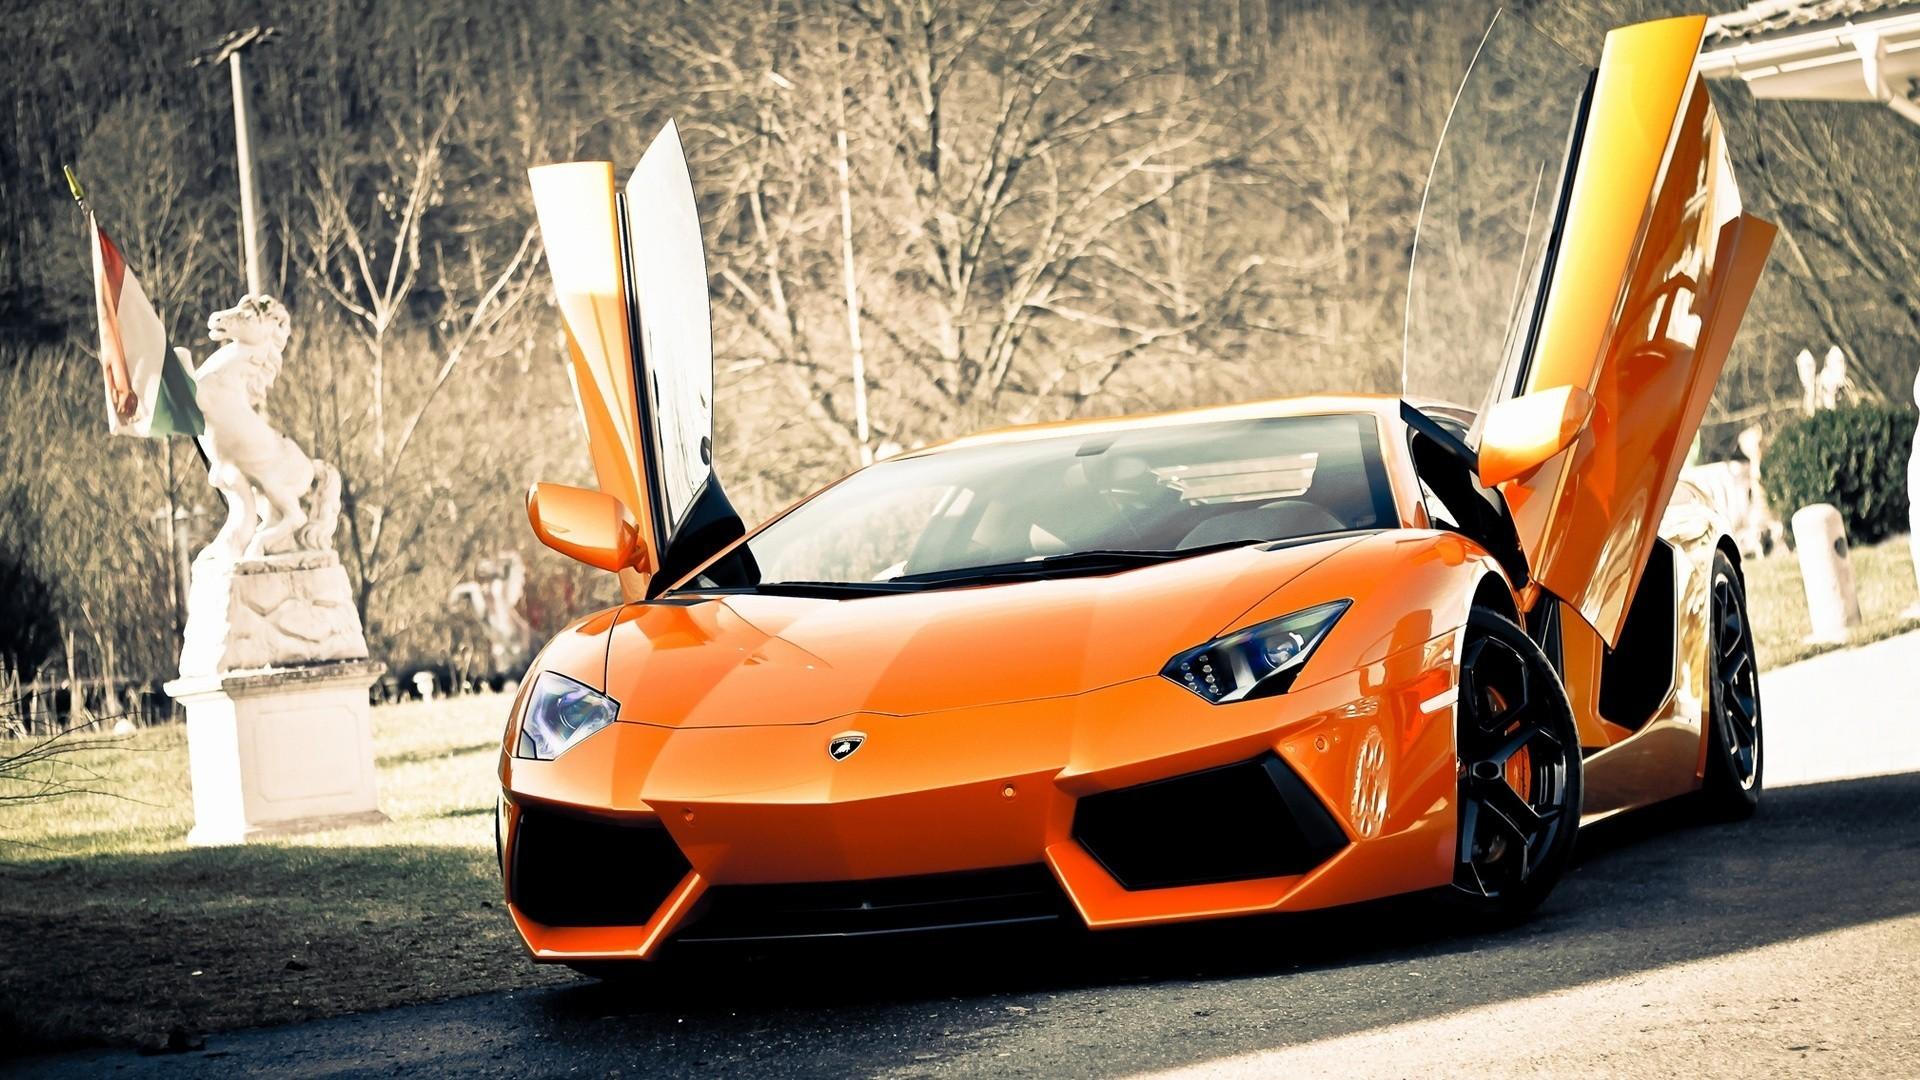 New Lamborghini Aventador Sports Cars HD Wallpaper